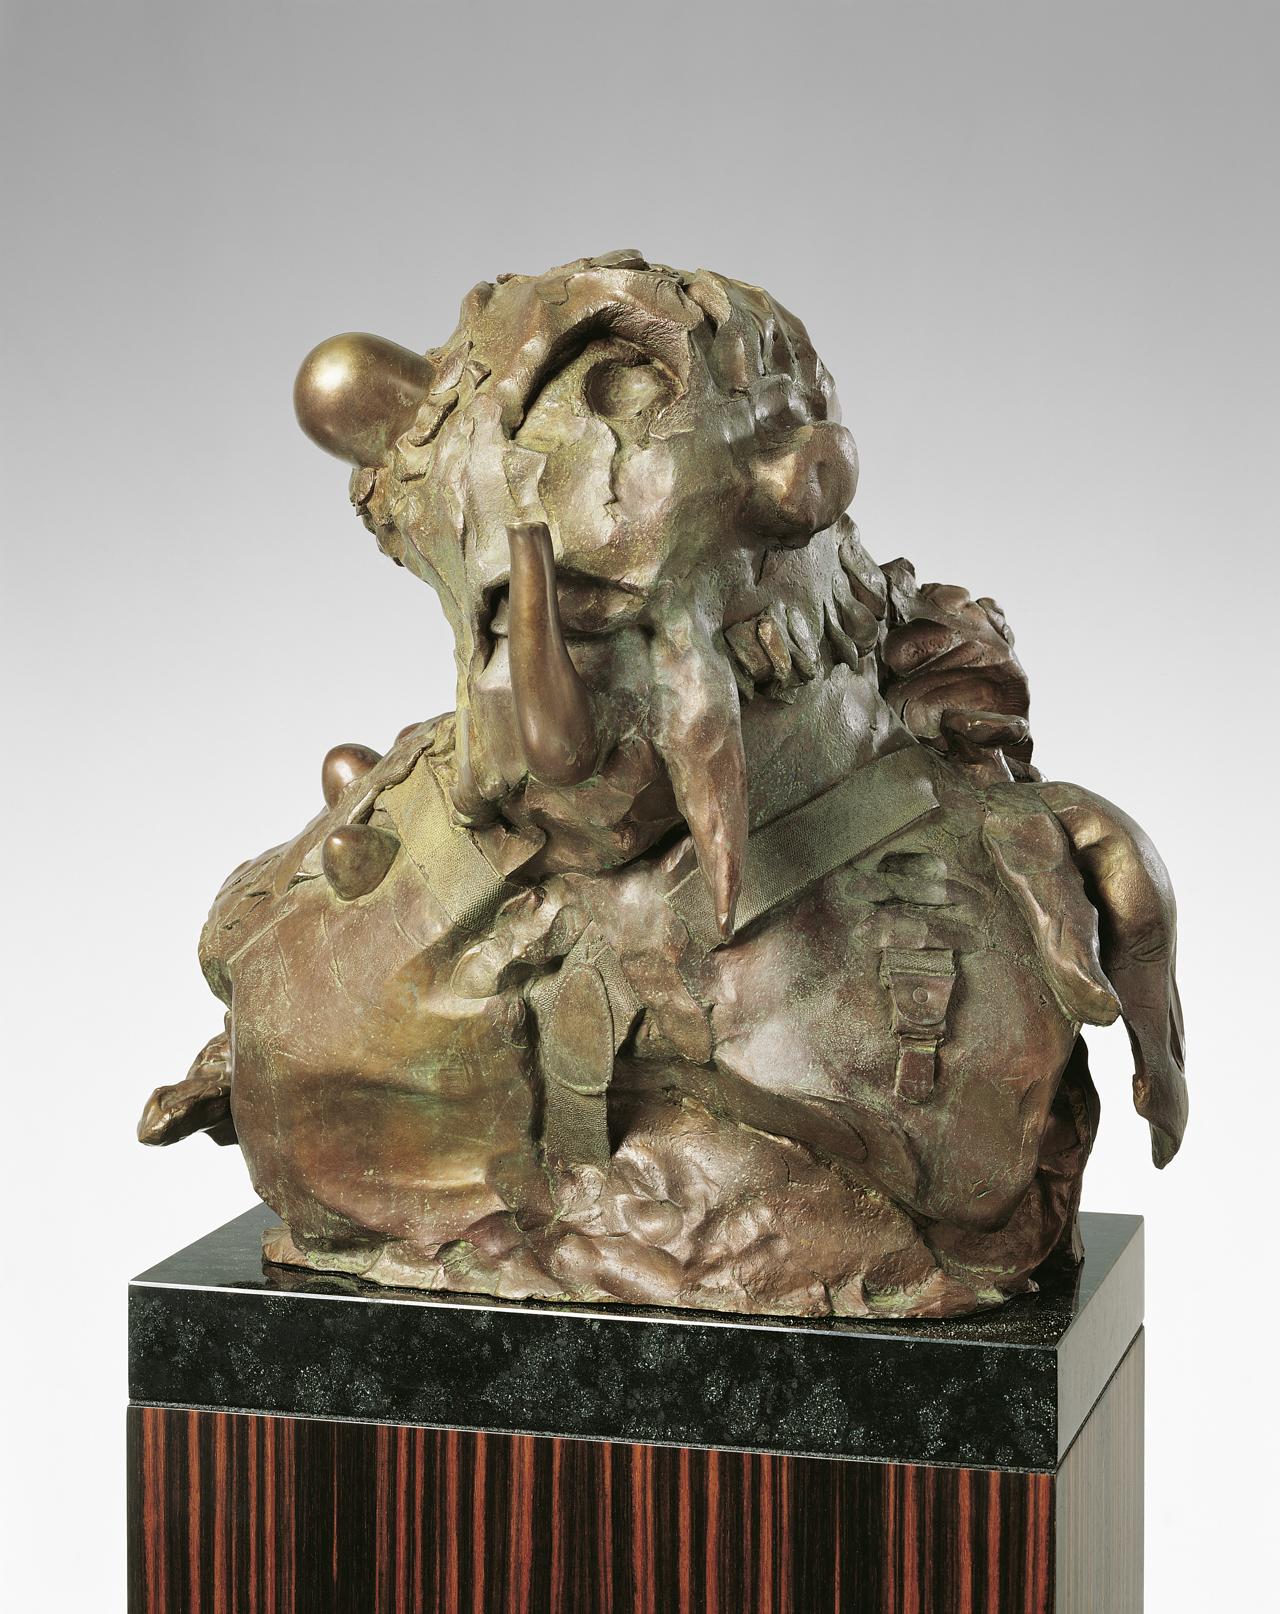 Jonathan Meese, General SWEETIE (Wau-Wau im Wolfsfell), 2007, Bronze, 54 x 56 x 49 cm